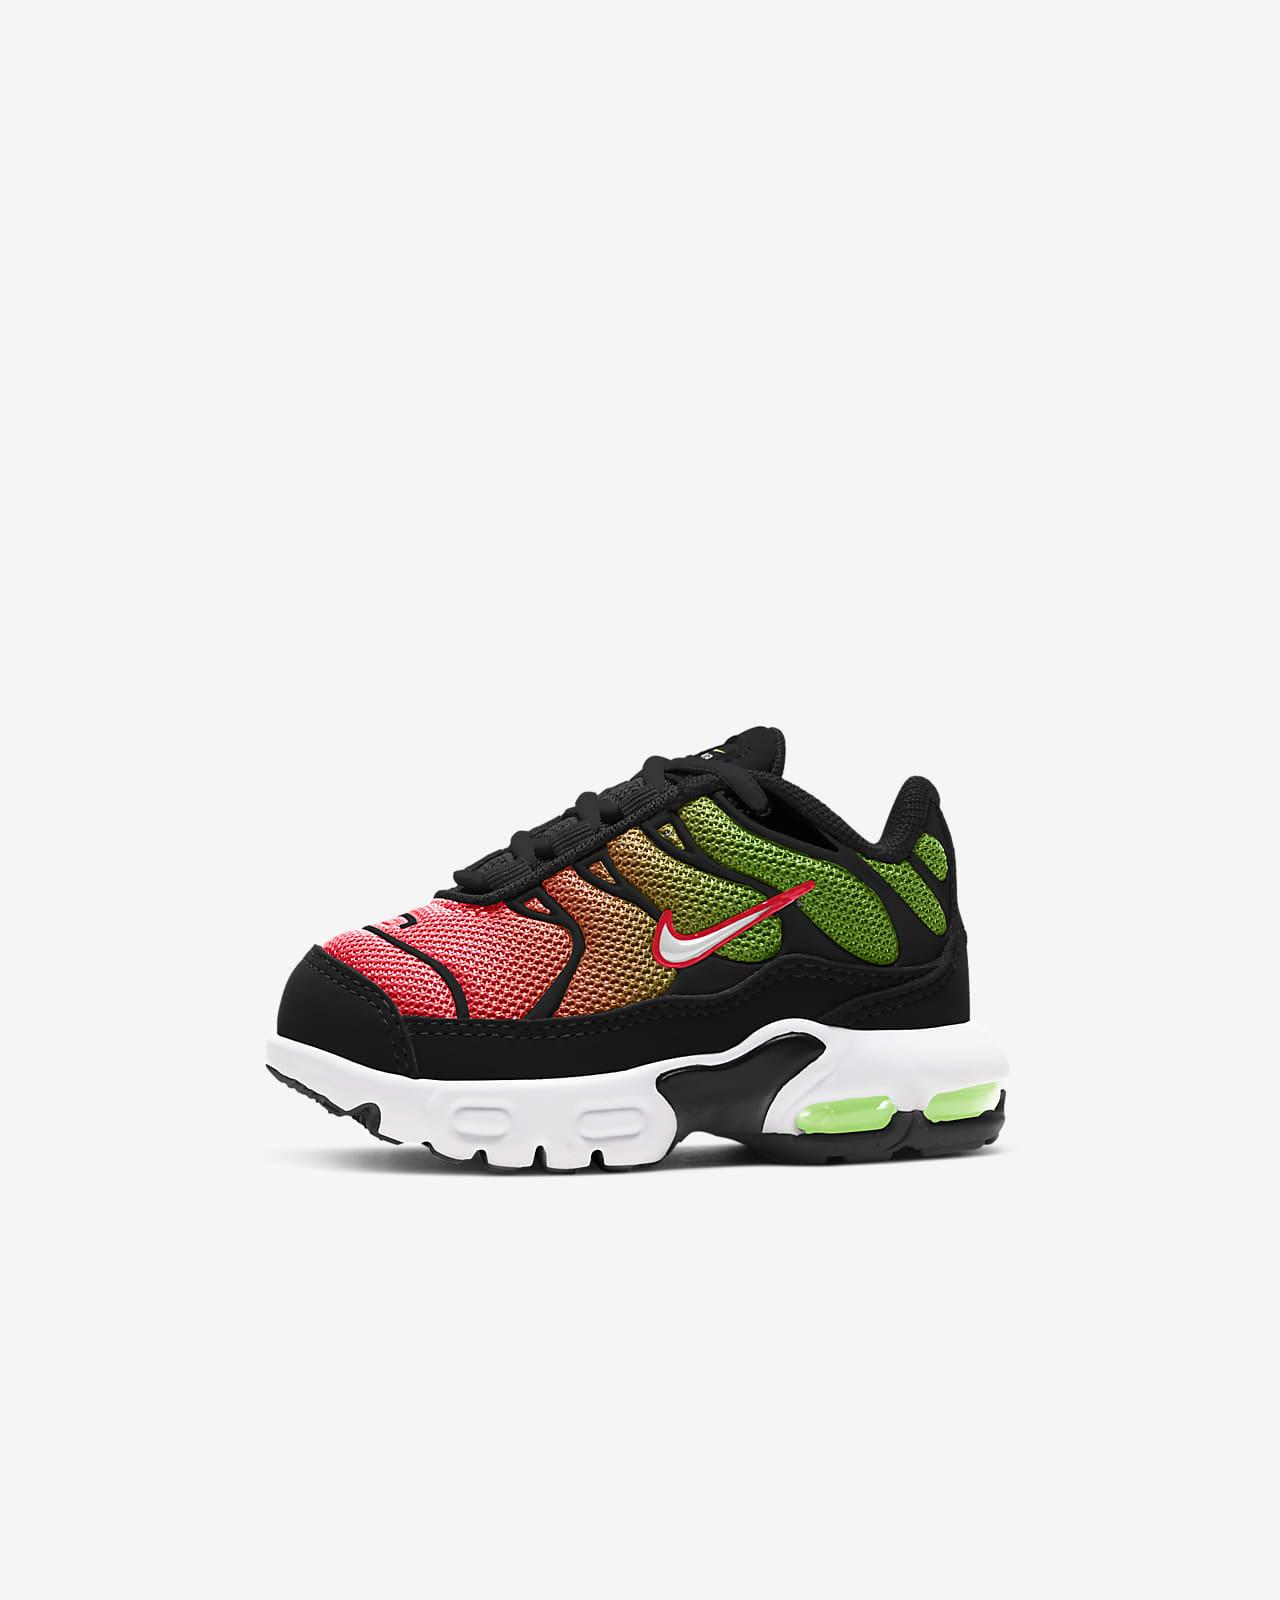 Nike Air Max Plus Bebek Ayakkabısı